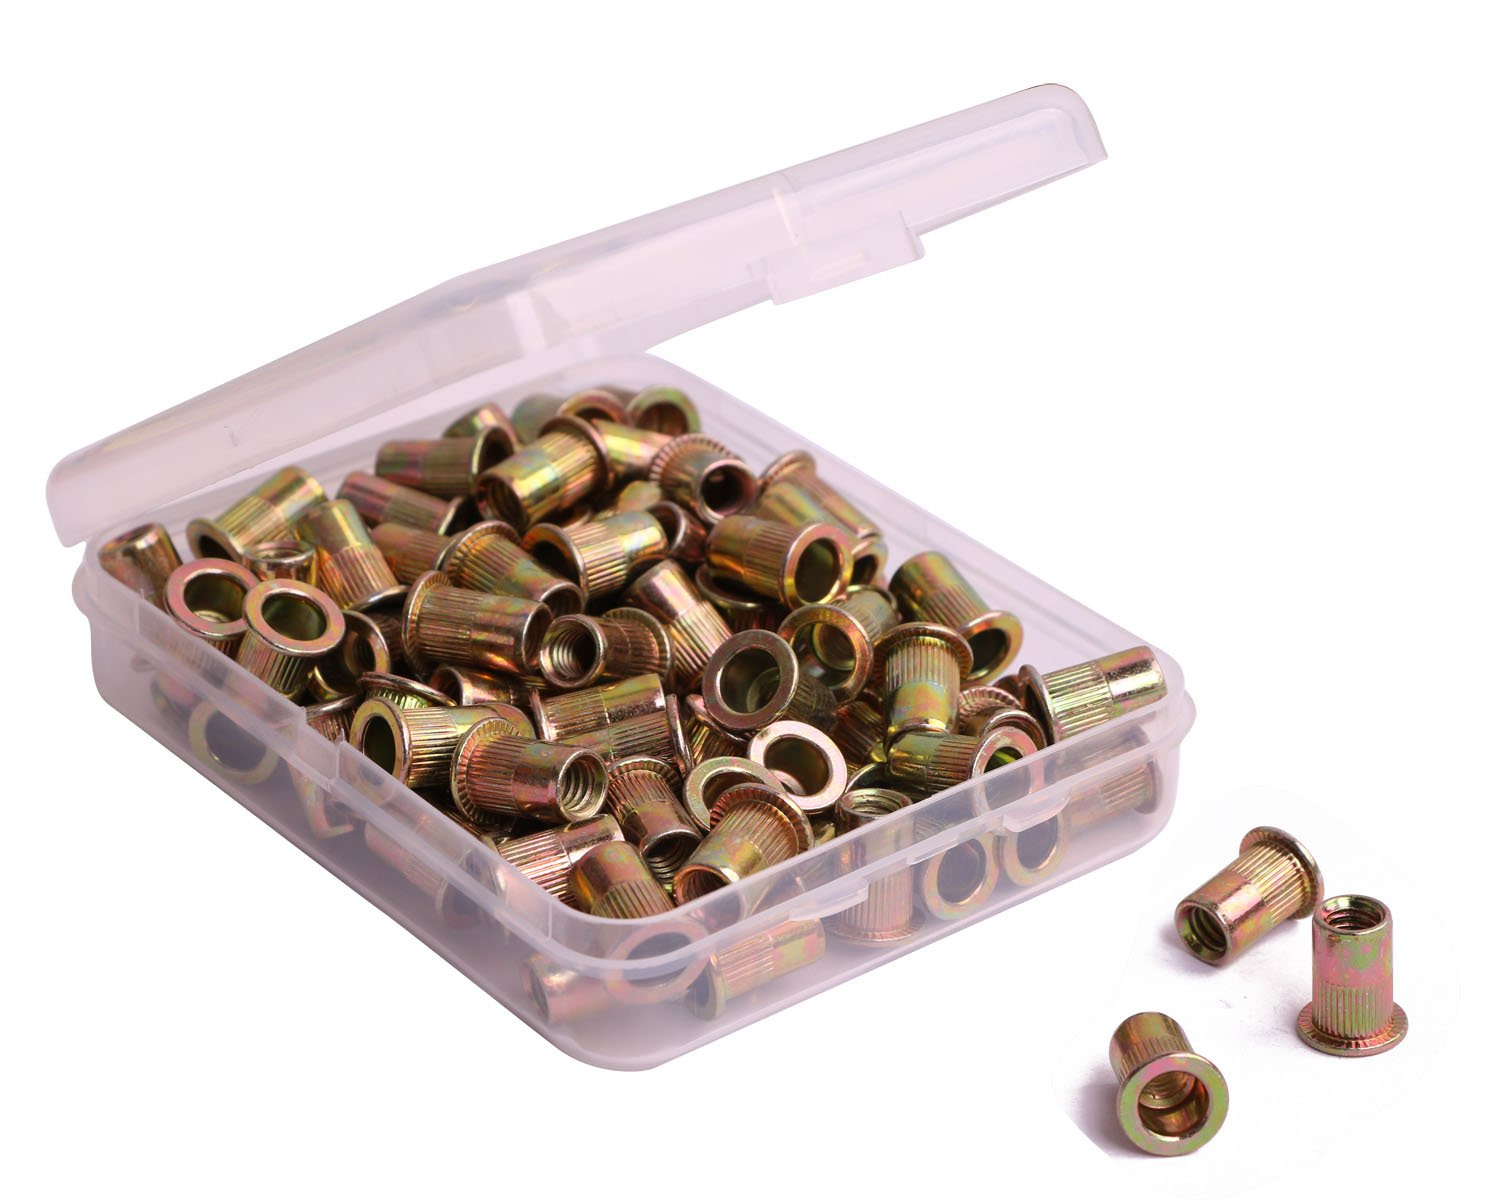 "Shapenty Zinc Plated Carbon Steel Rivet Nut Flat Head Threaded Rivnut Insert Nutsert 1/4""-20, 100PCS"